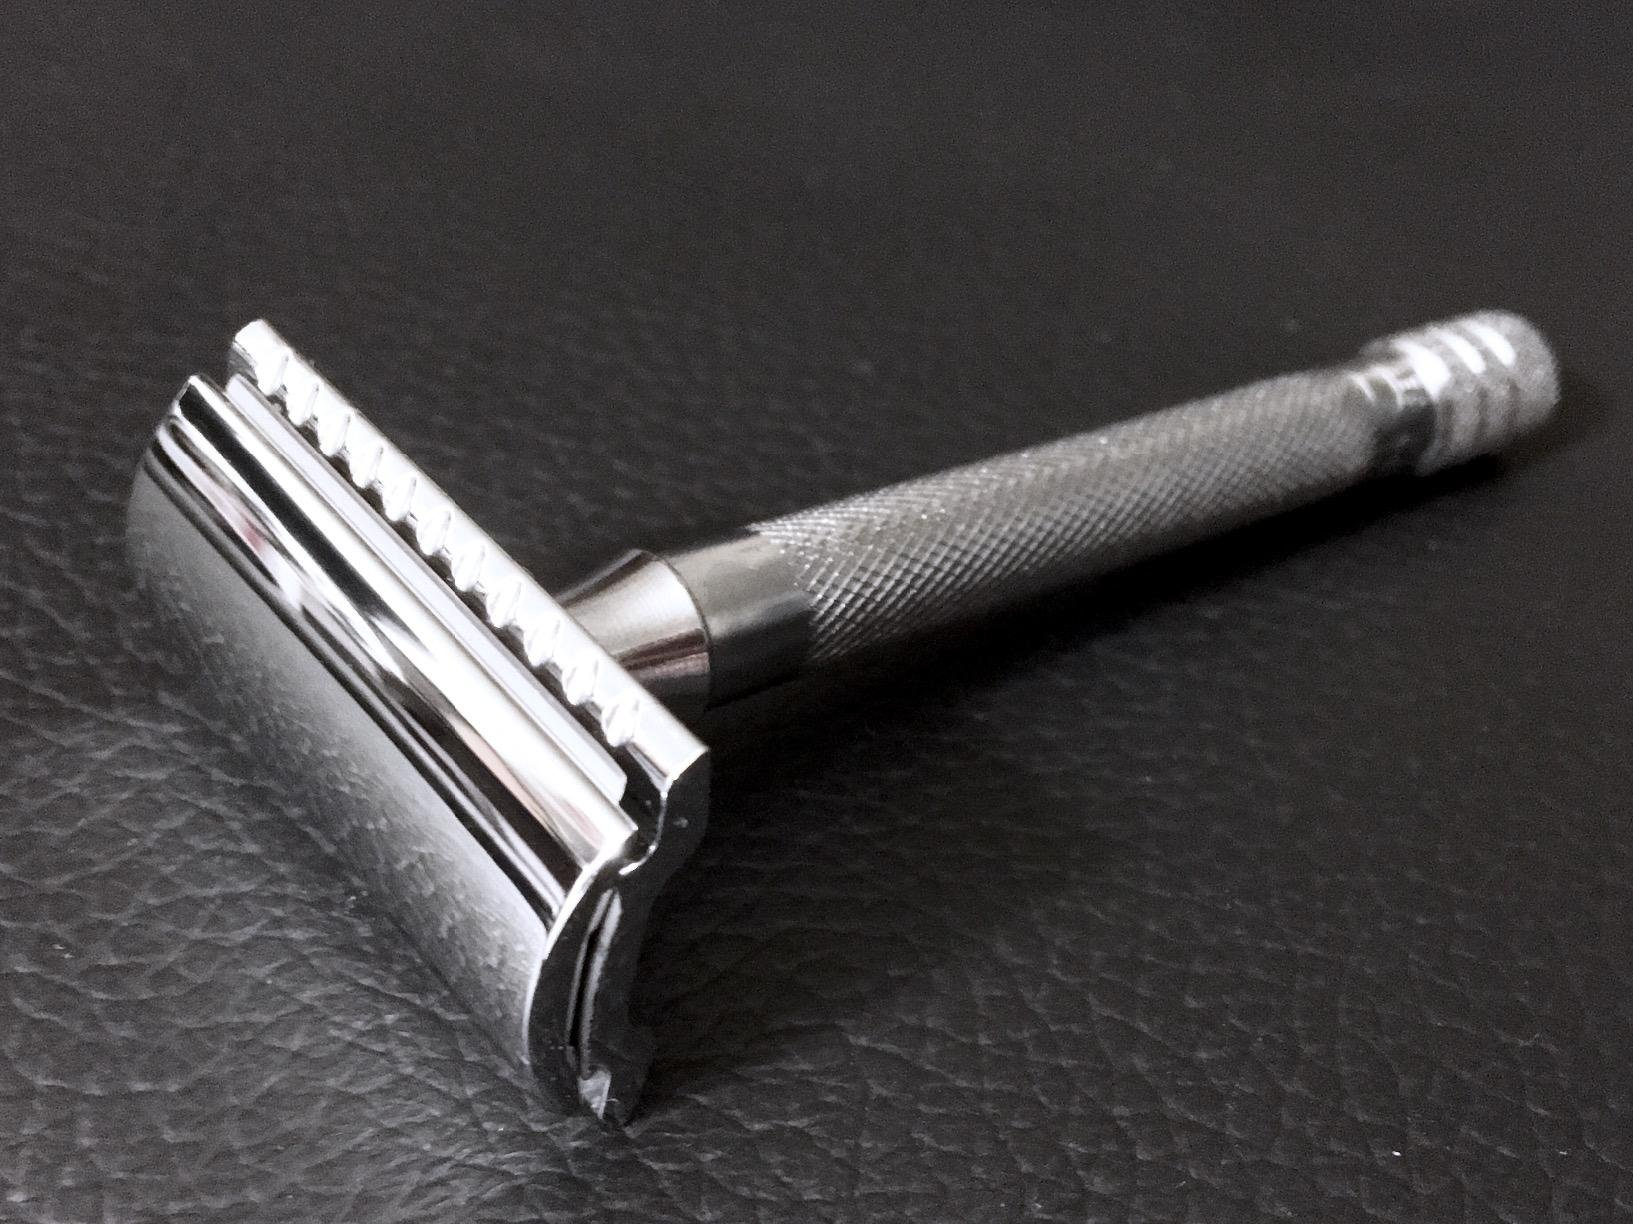 Merkur Long Handled Safety Razor Review   23C